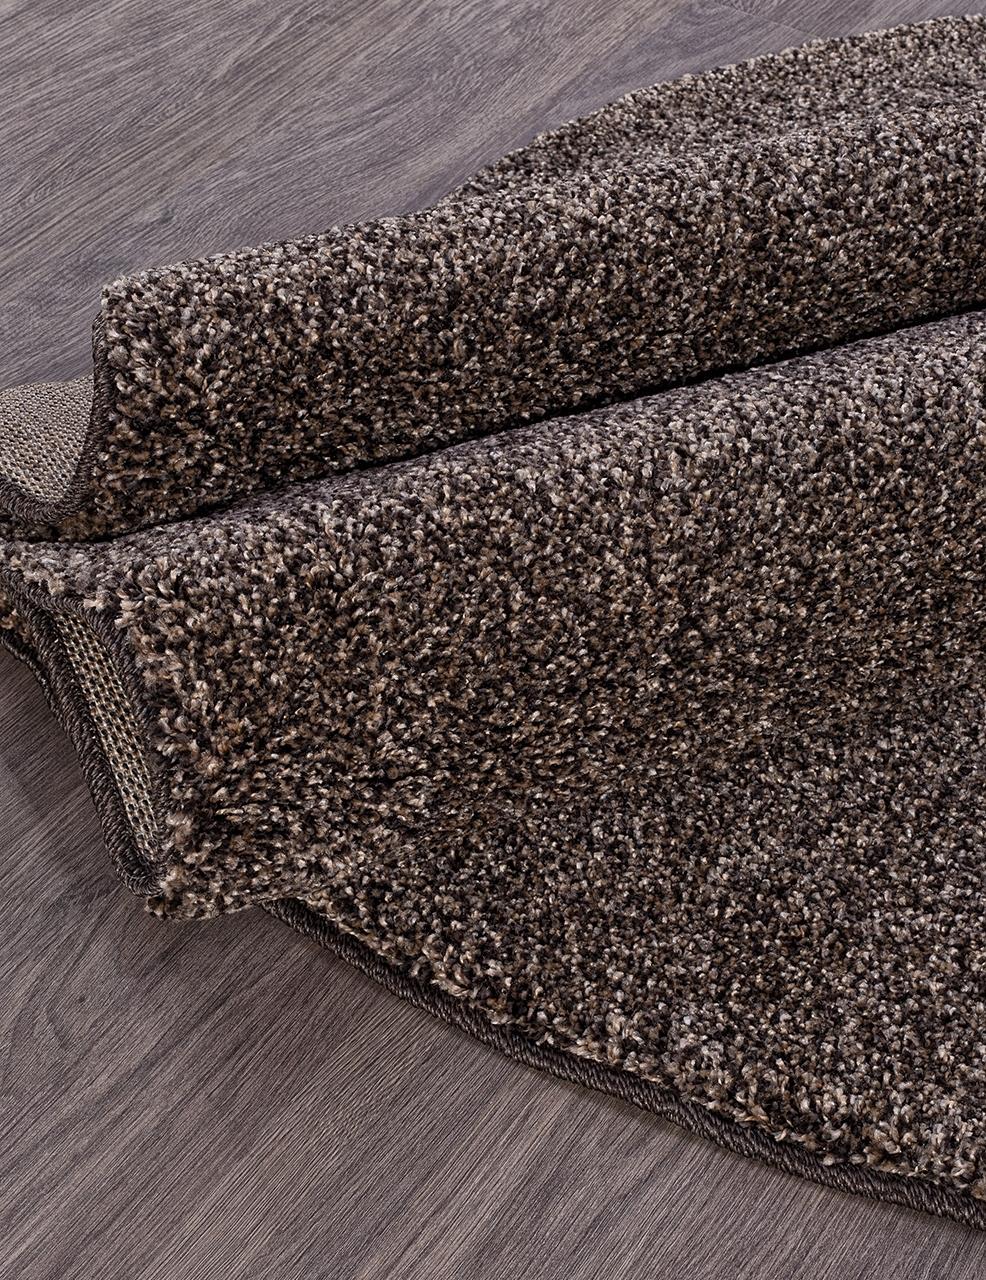 Ковер t600 - D.BEIGE-BROWN - Овал - коллекция PLATINUM - фото 3